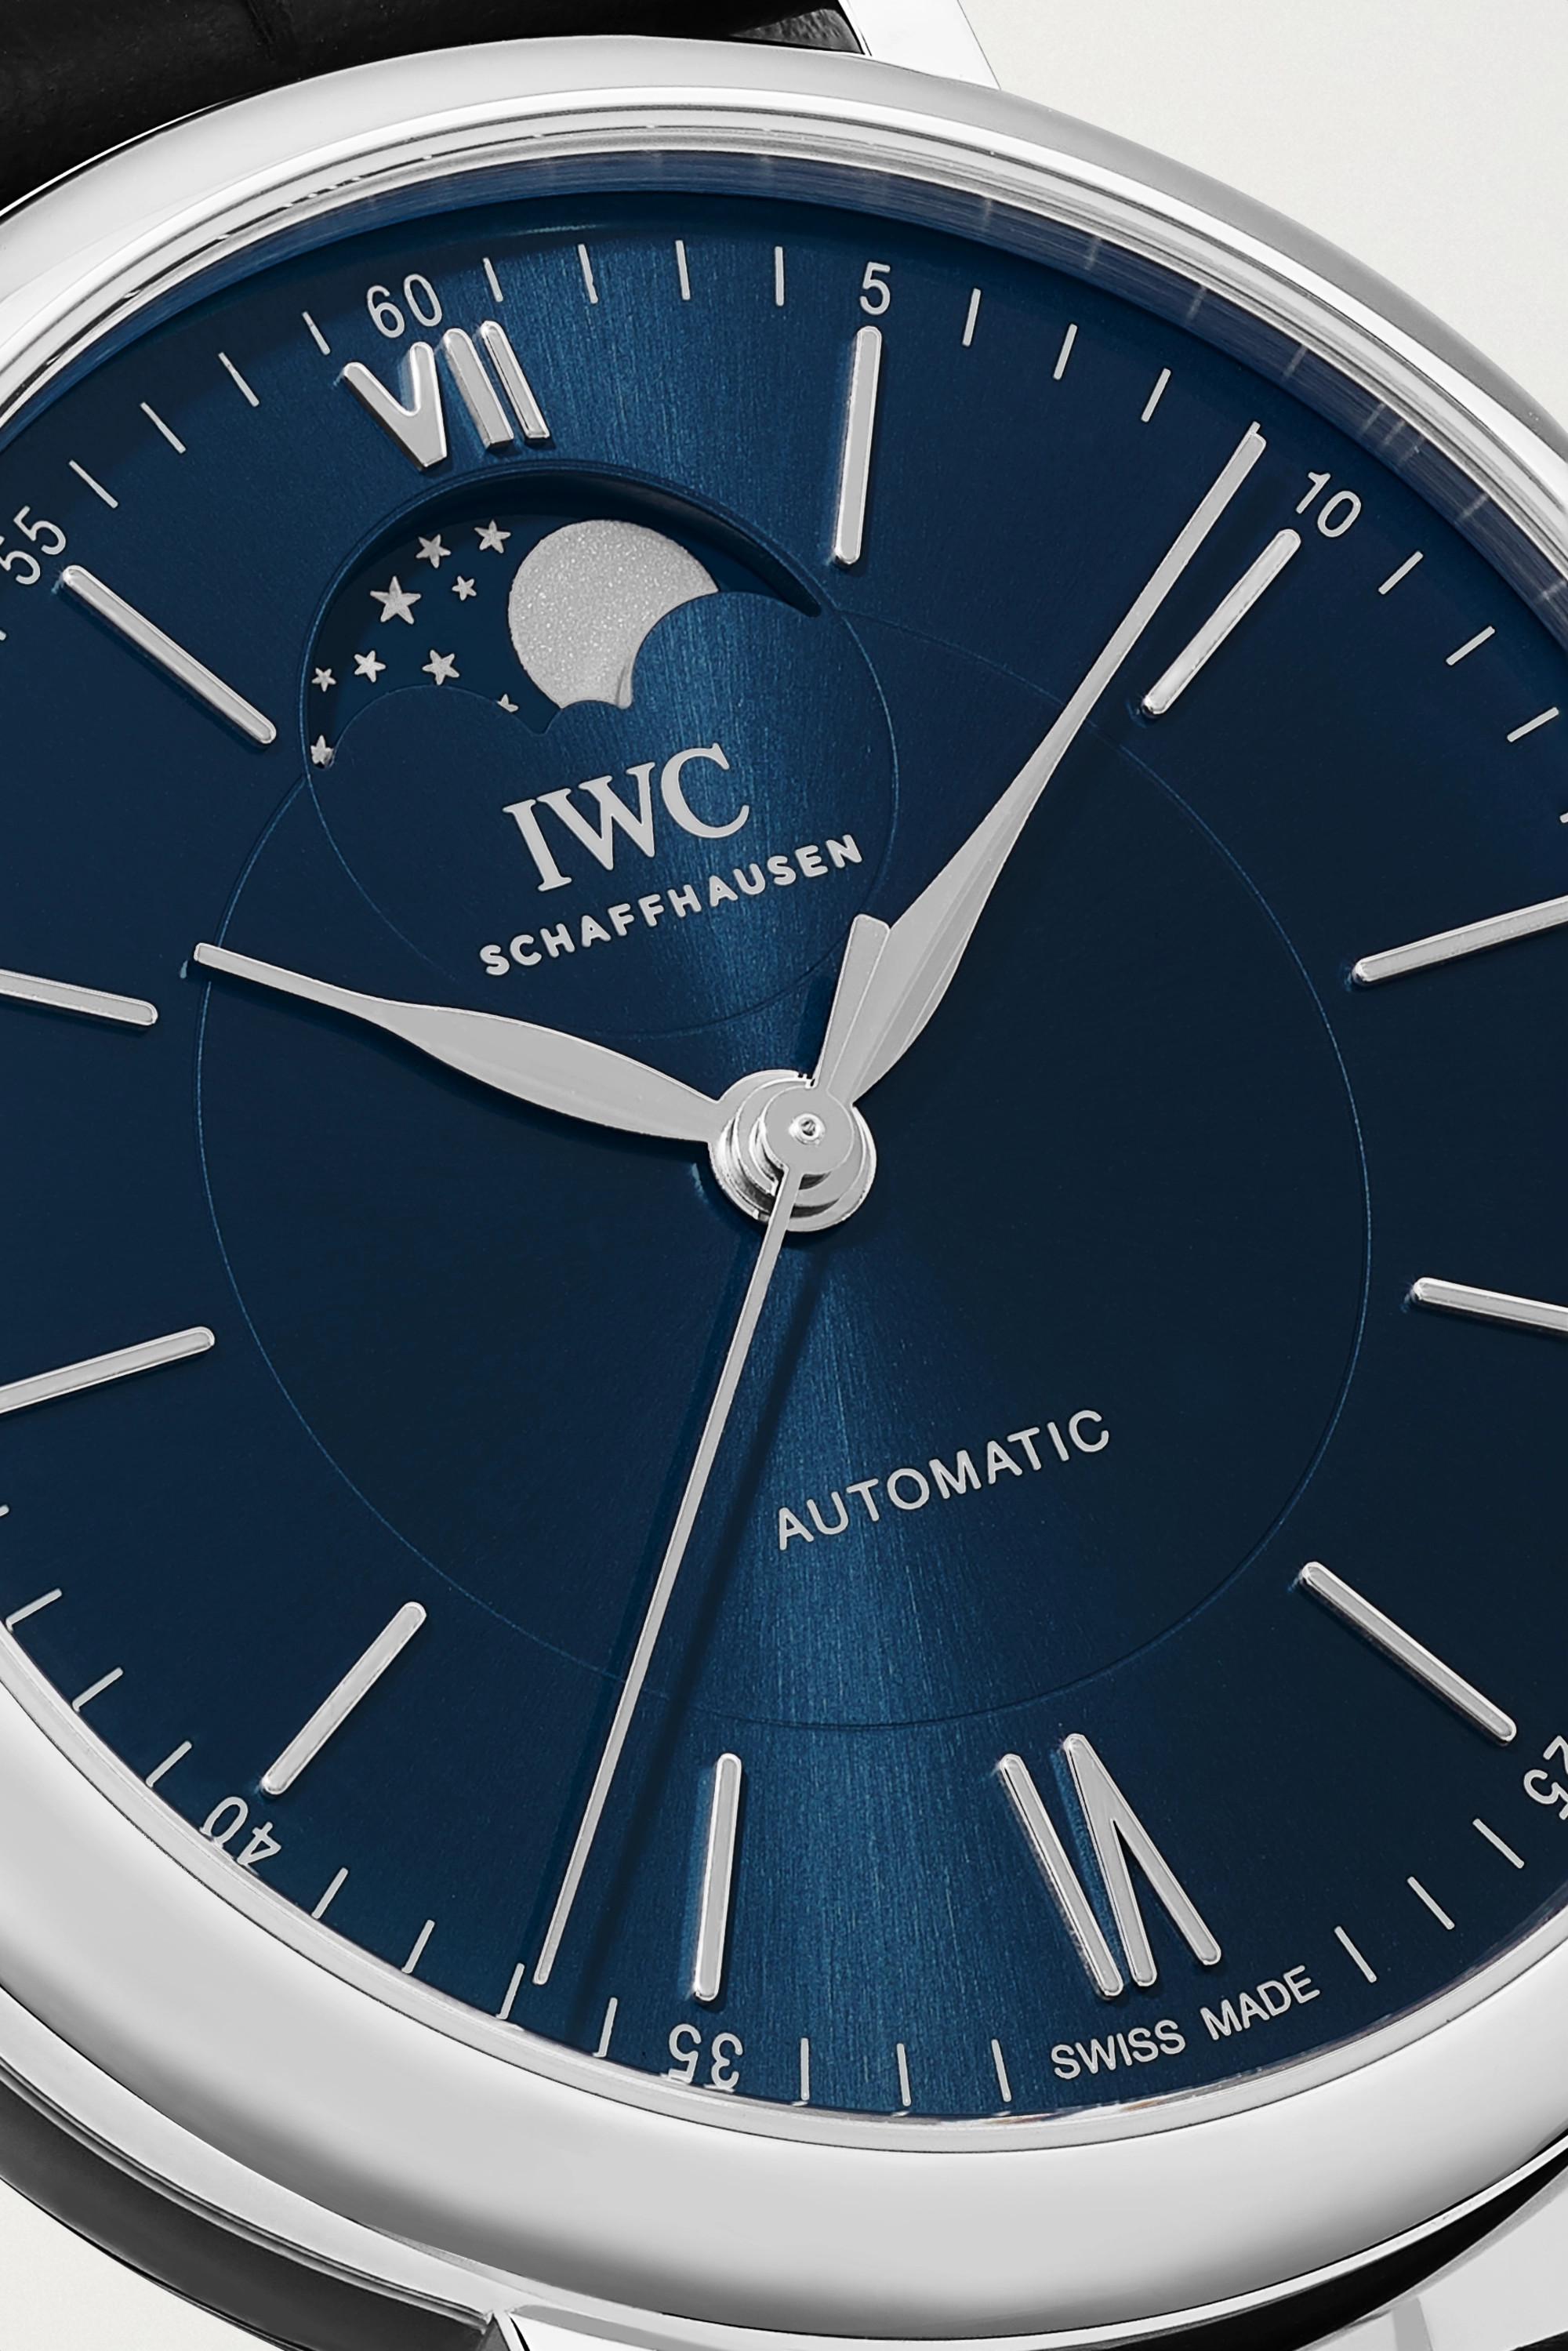 IWC SCHAFFHAUSEN Montre en acier inoxydable à bracelet en alligator Portofino Automatic Moon Phase 40 mm